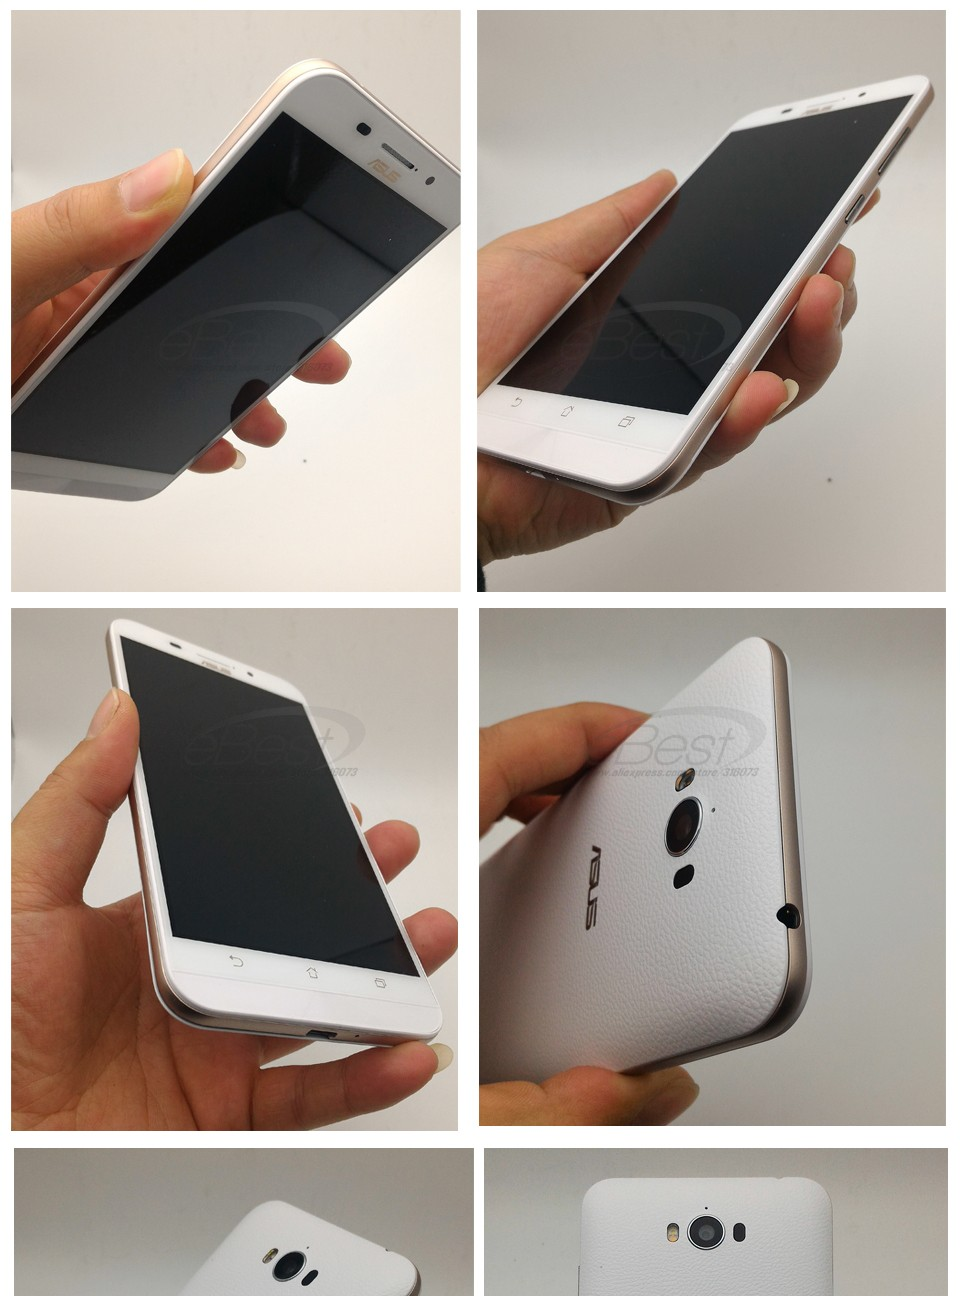 Original Asus Zenfone Max Mobile Phone 5000mah Battery 55 Inch 2 Laser Ze601kl Free Zenflash Basic Information Model